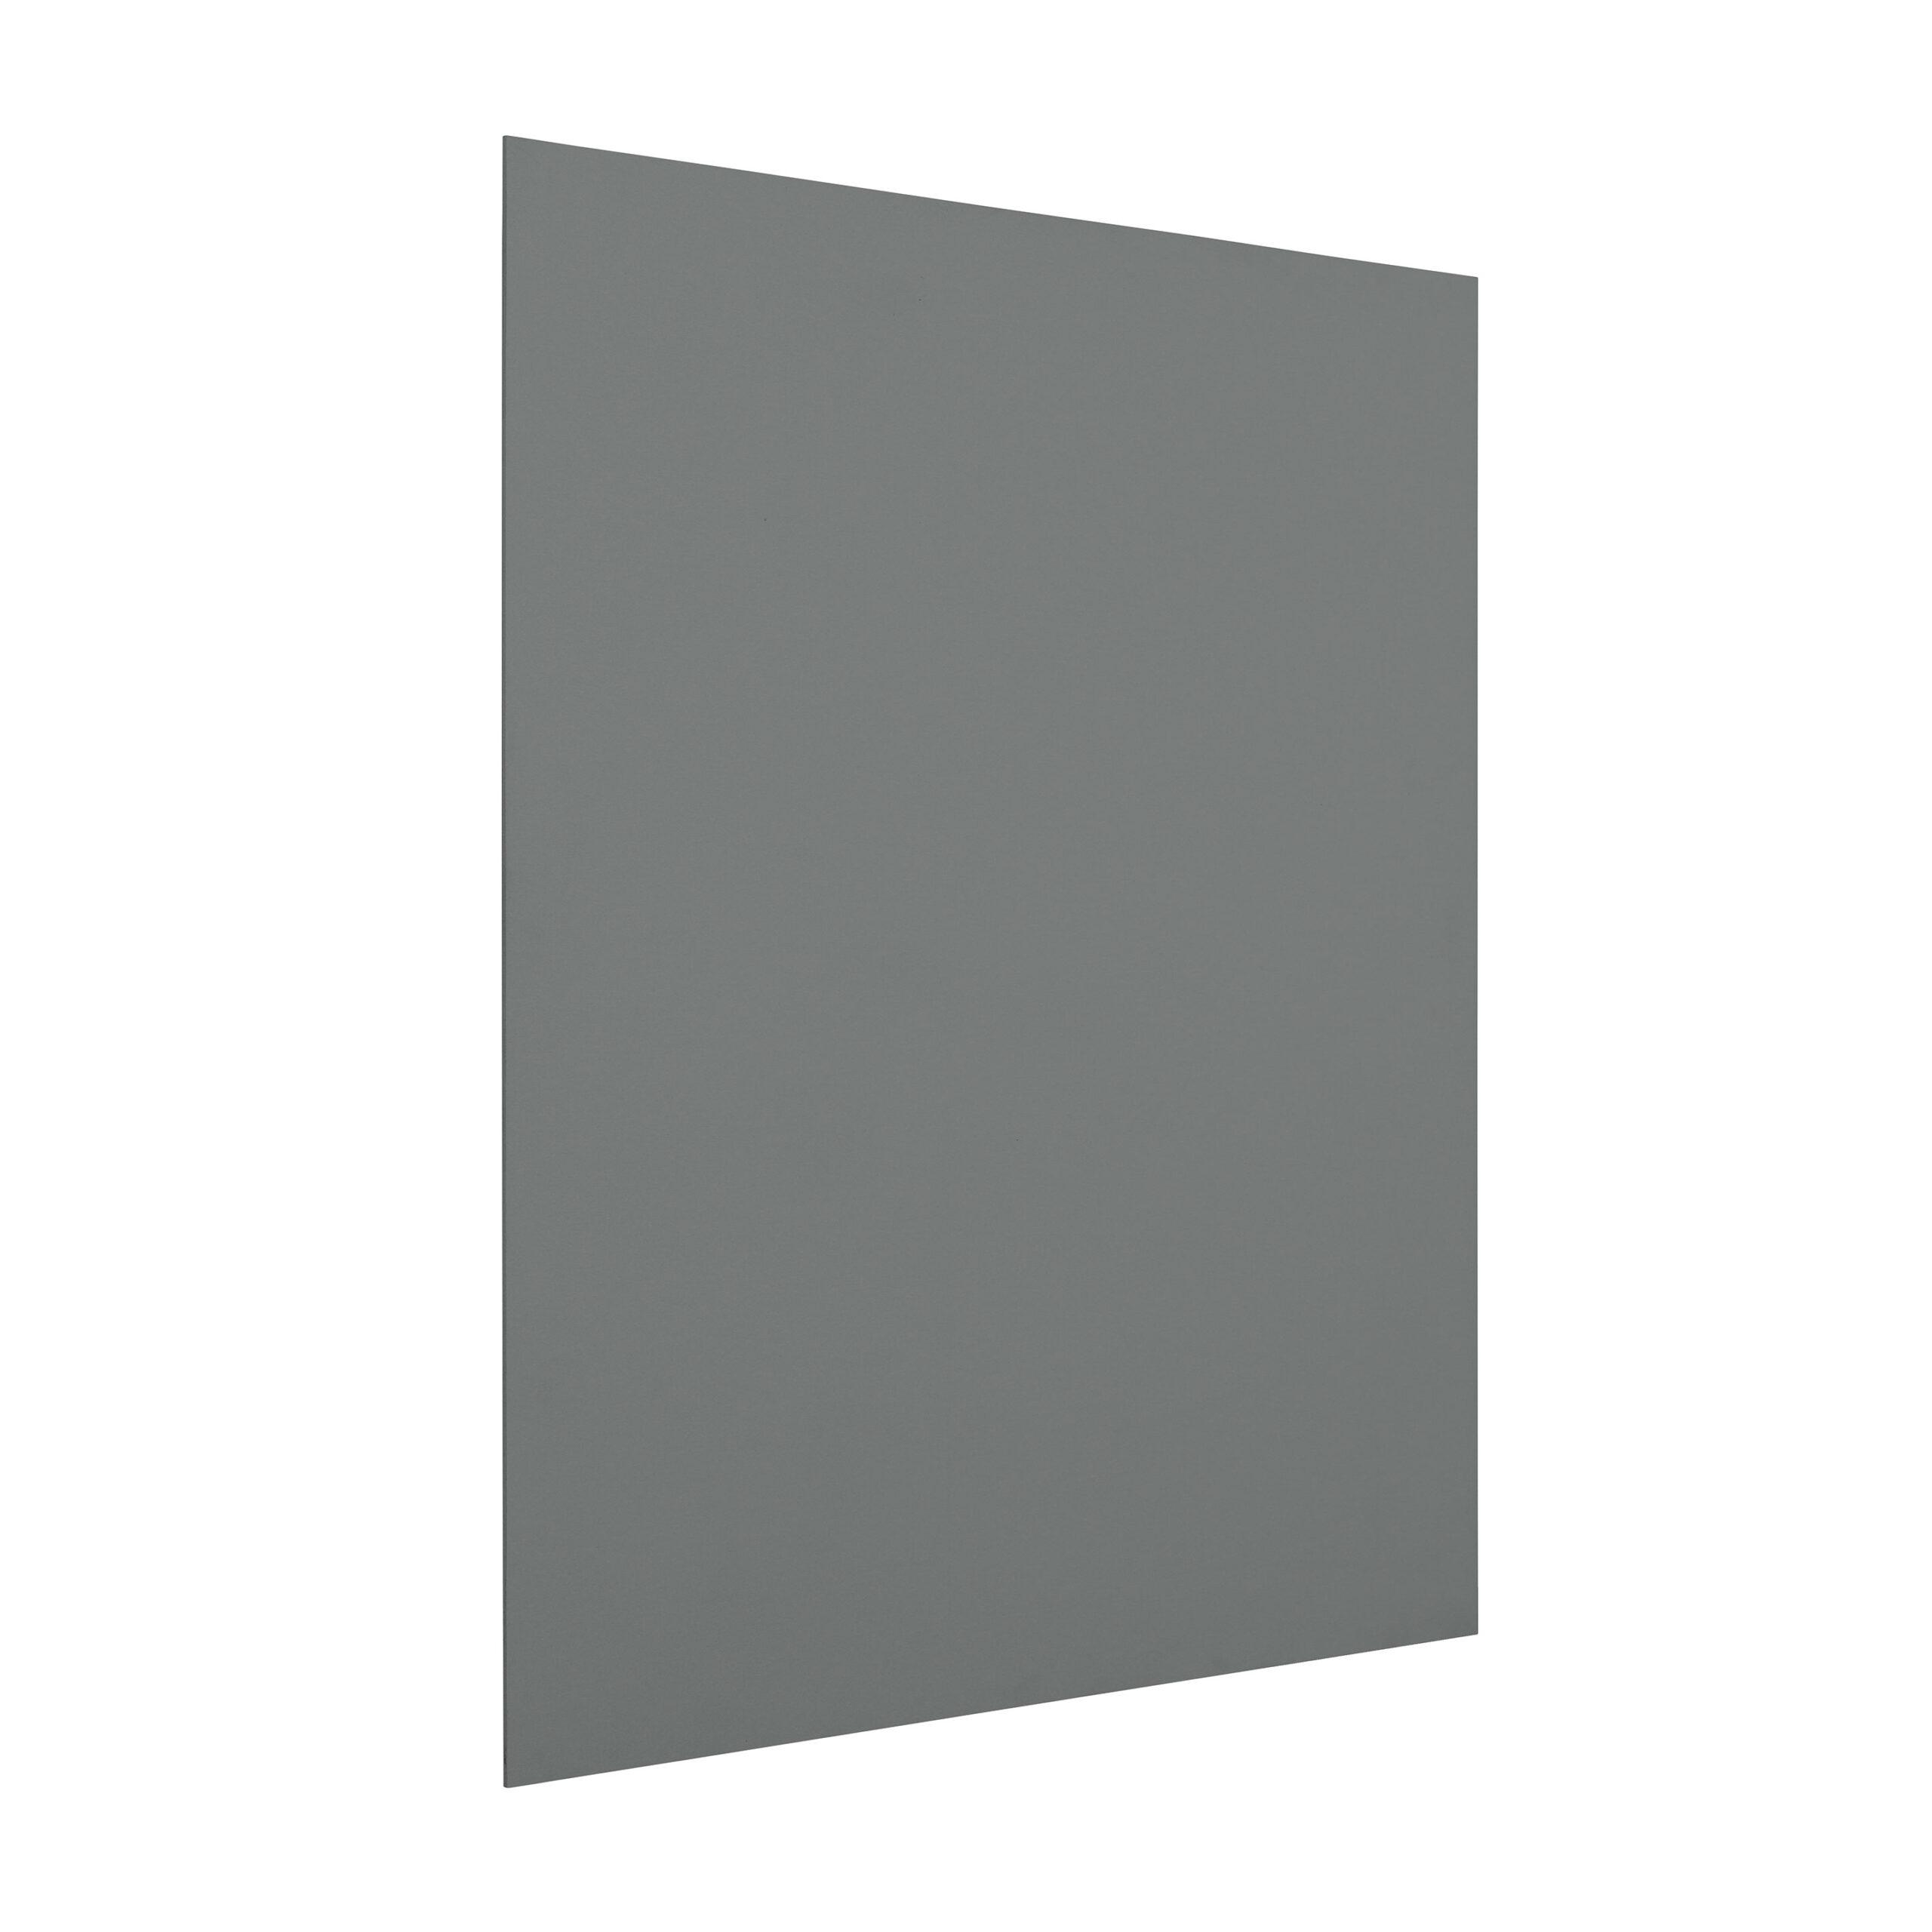 Space-Bulletin-Board_07